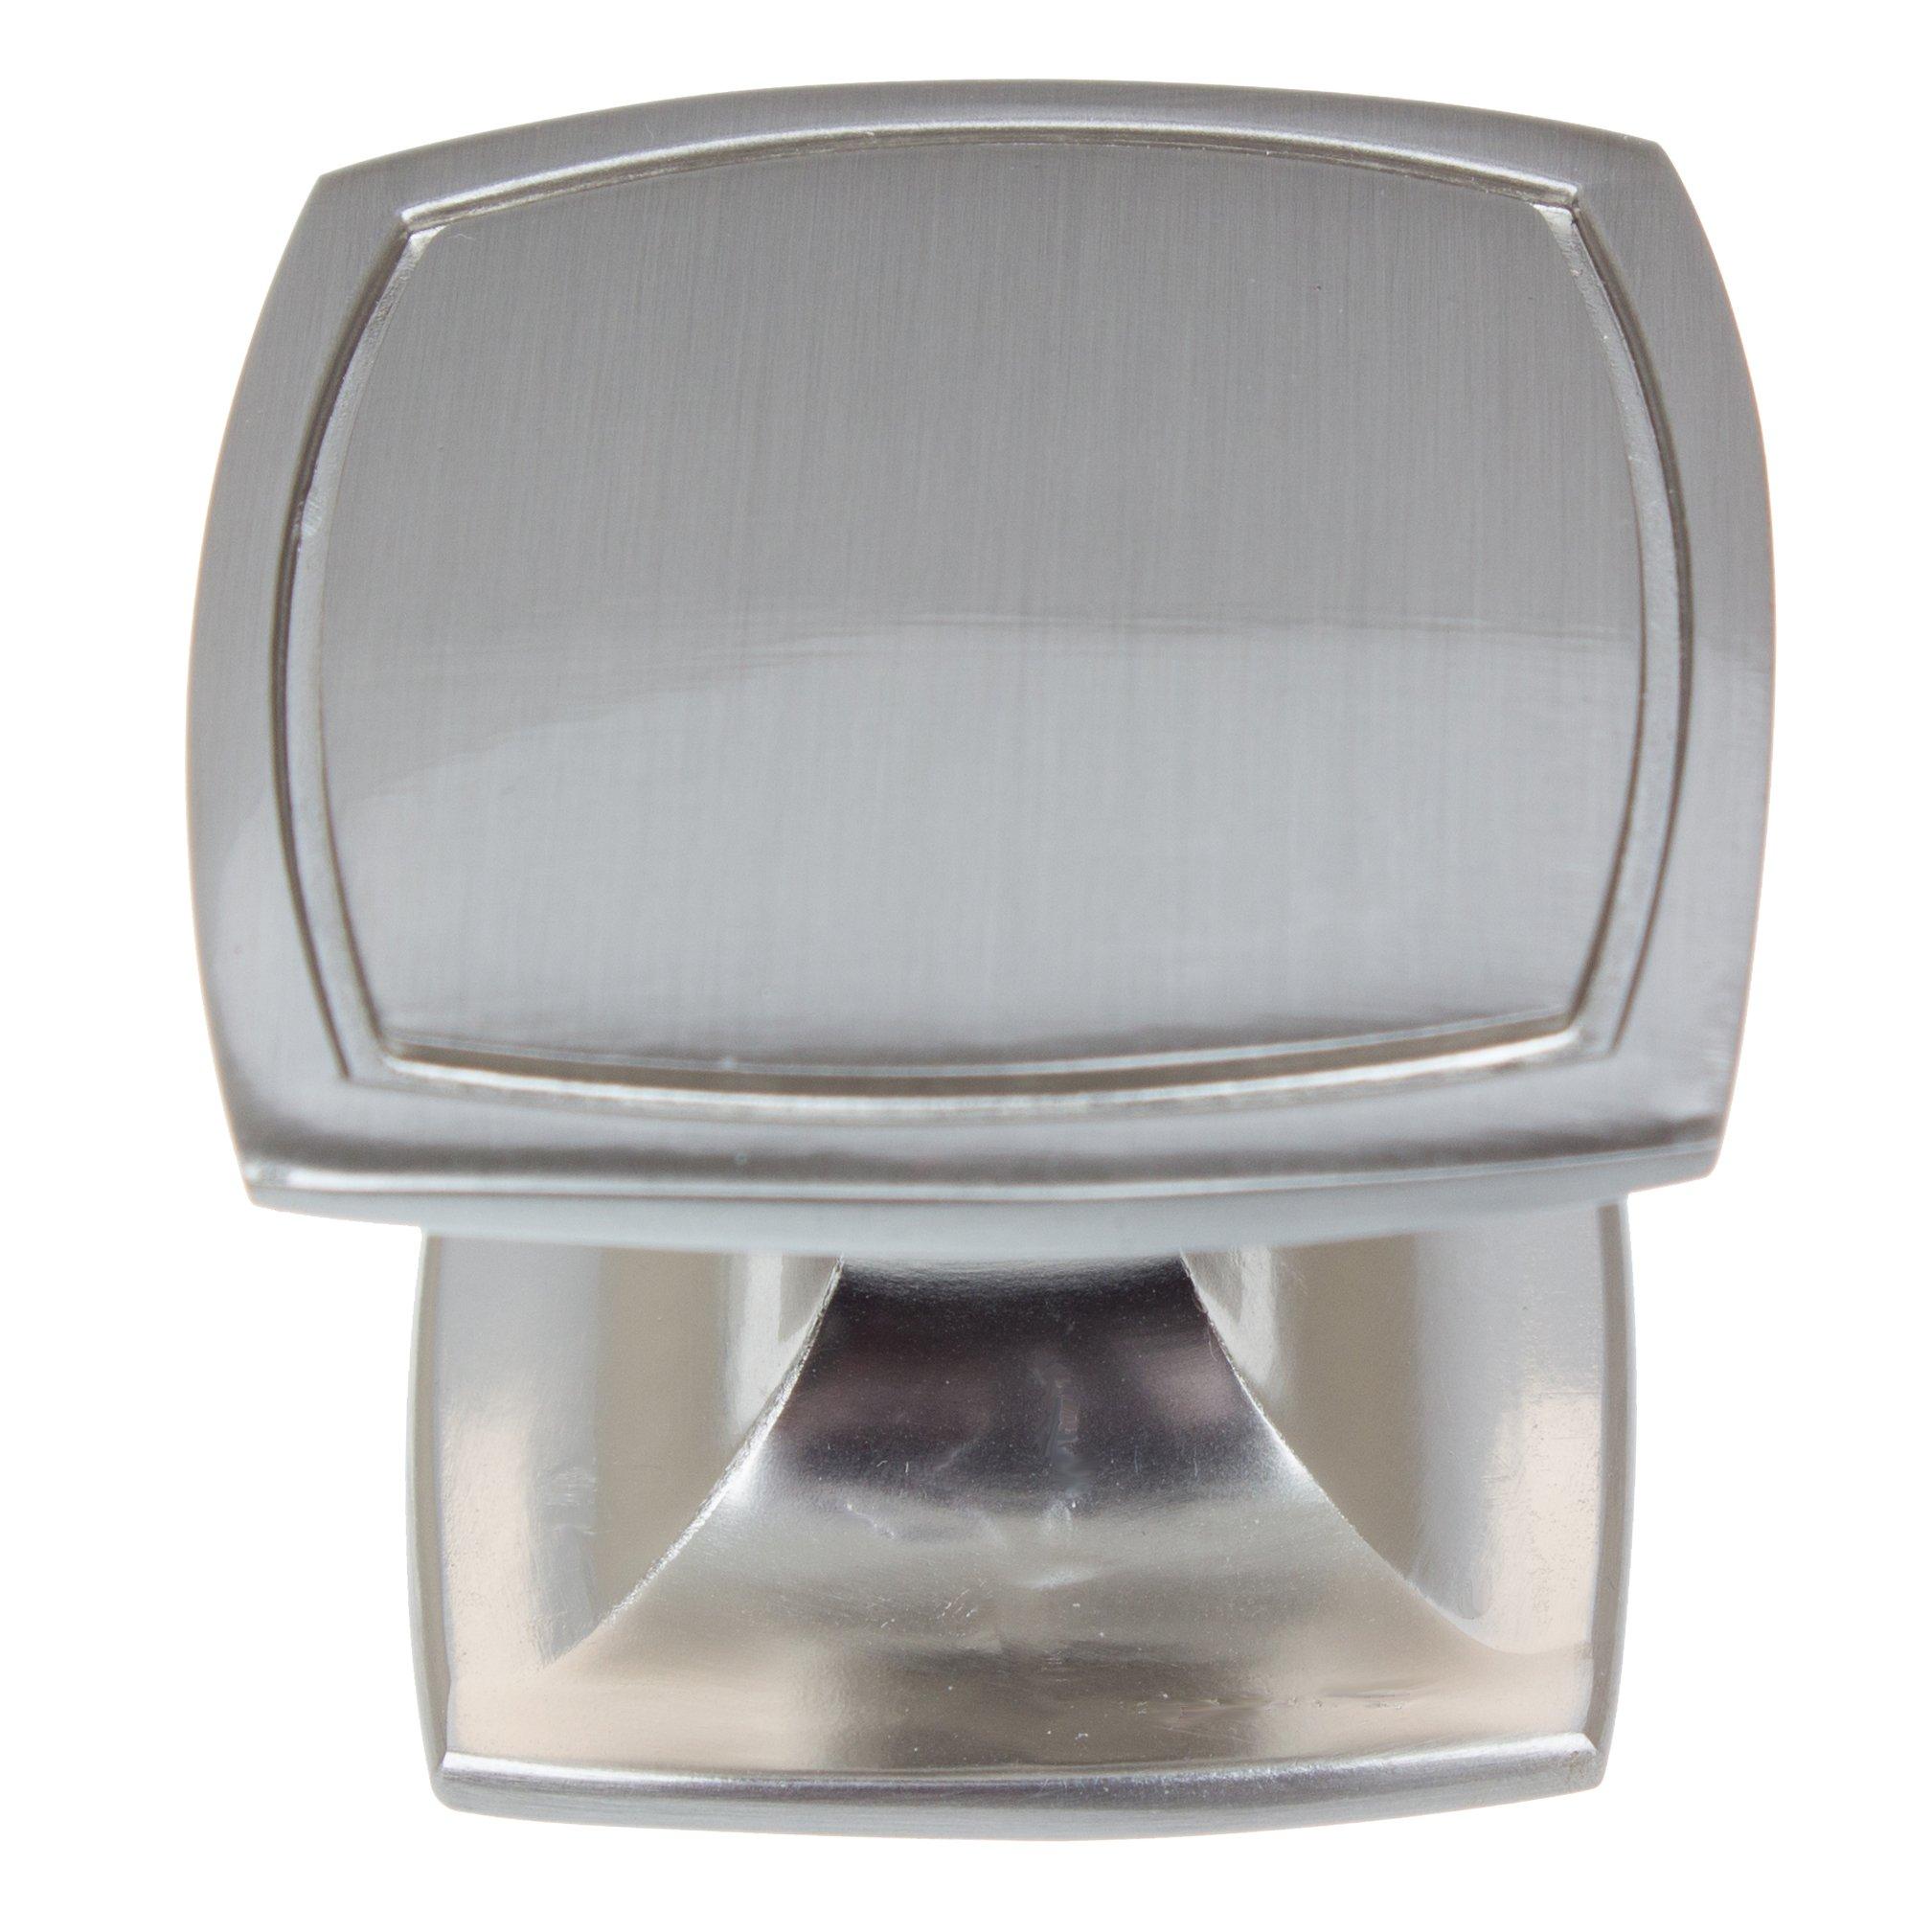 GlideRite Hardware 901412-SN-50 Square Cabinet Knobs, 50 Pack, 1.5'', Satin Nickel